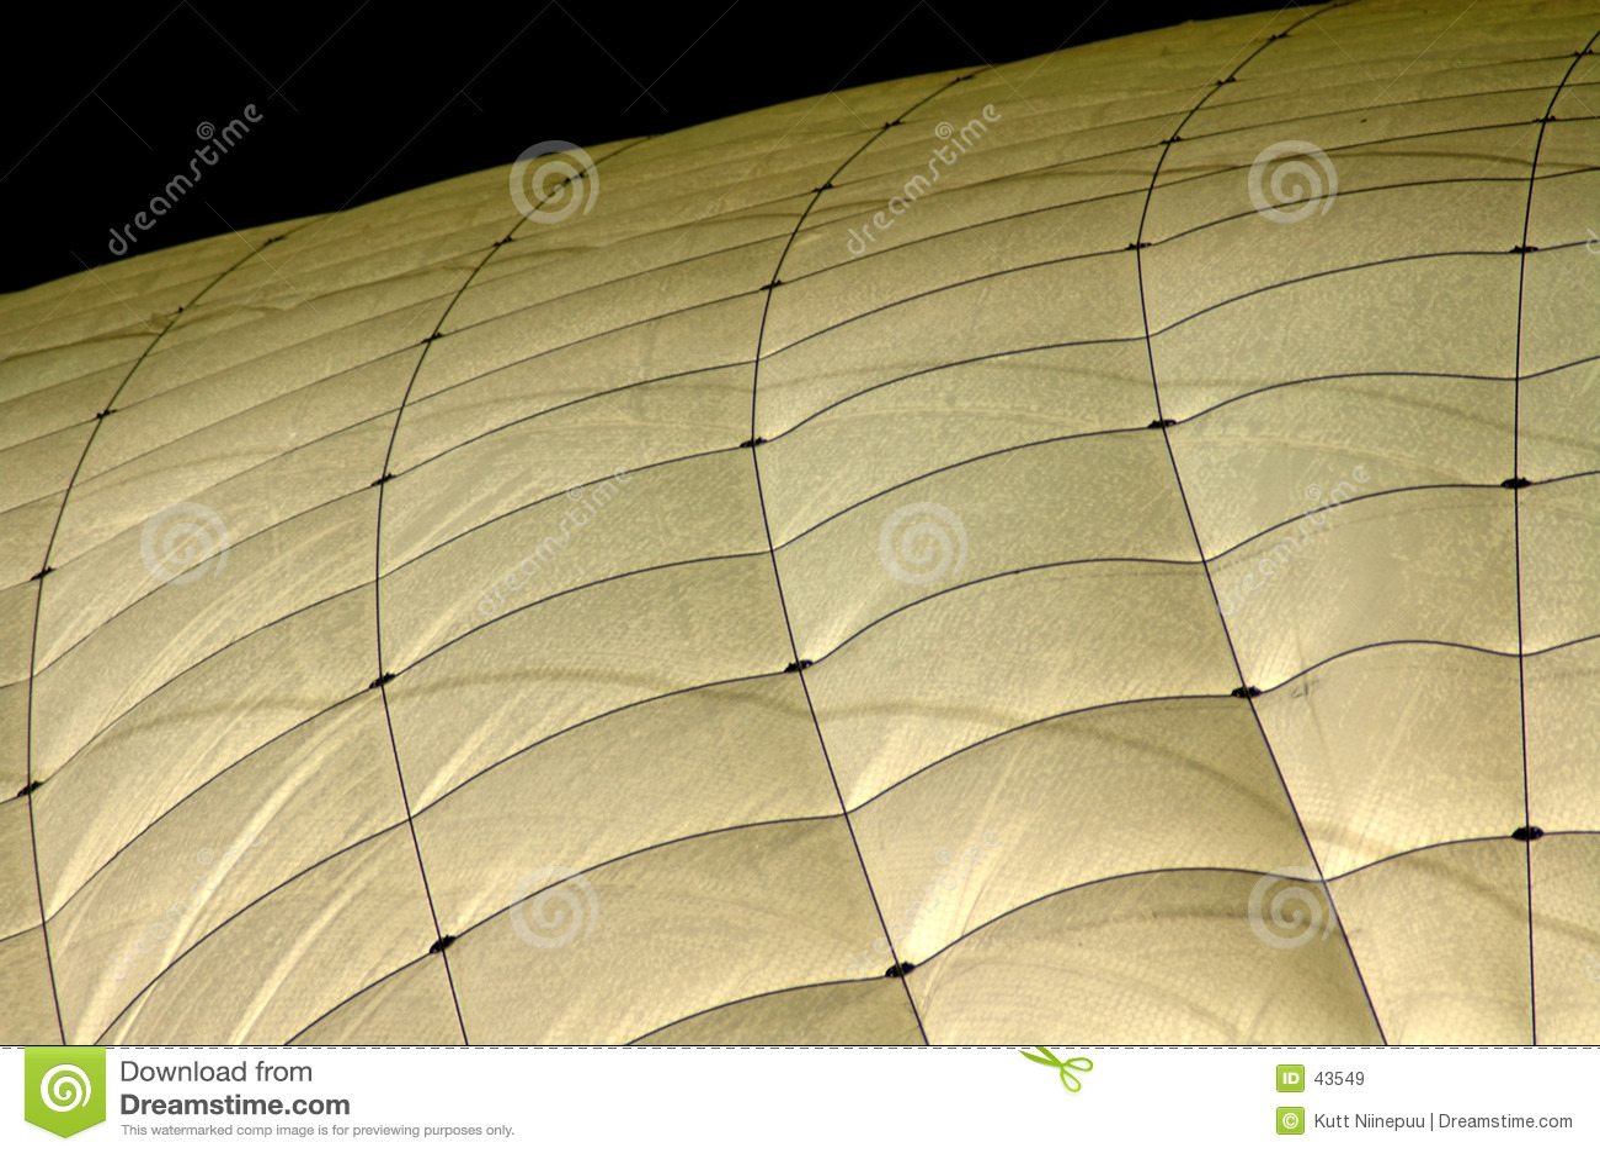 Tennis hall roof